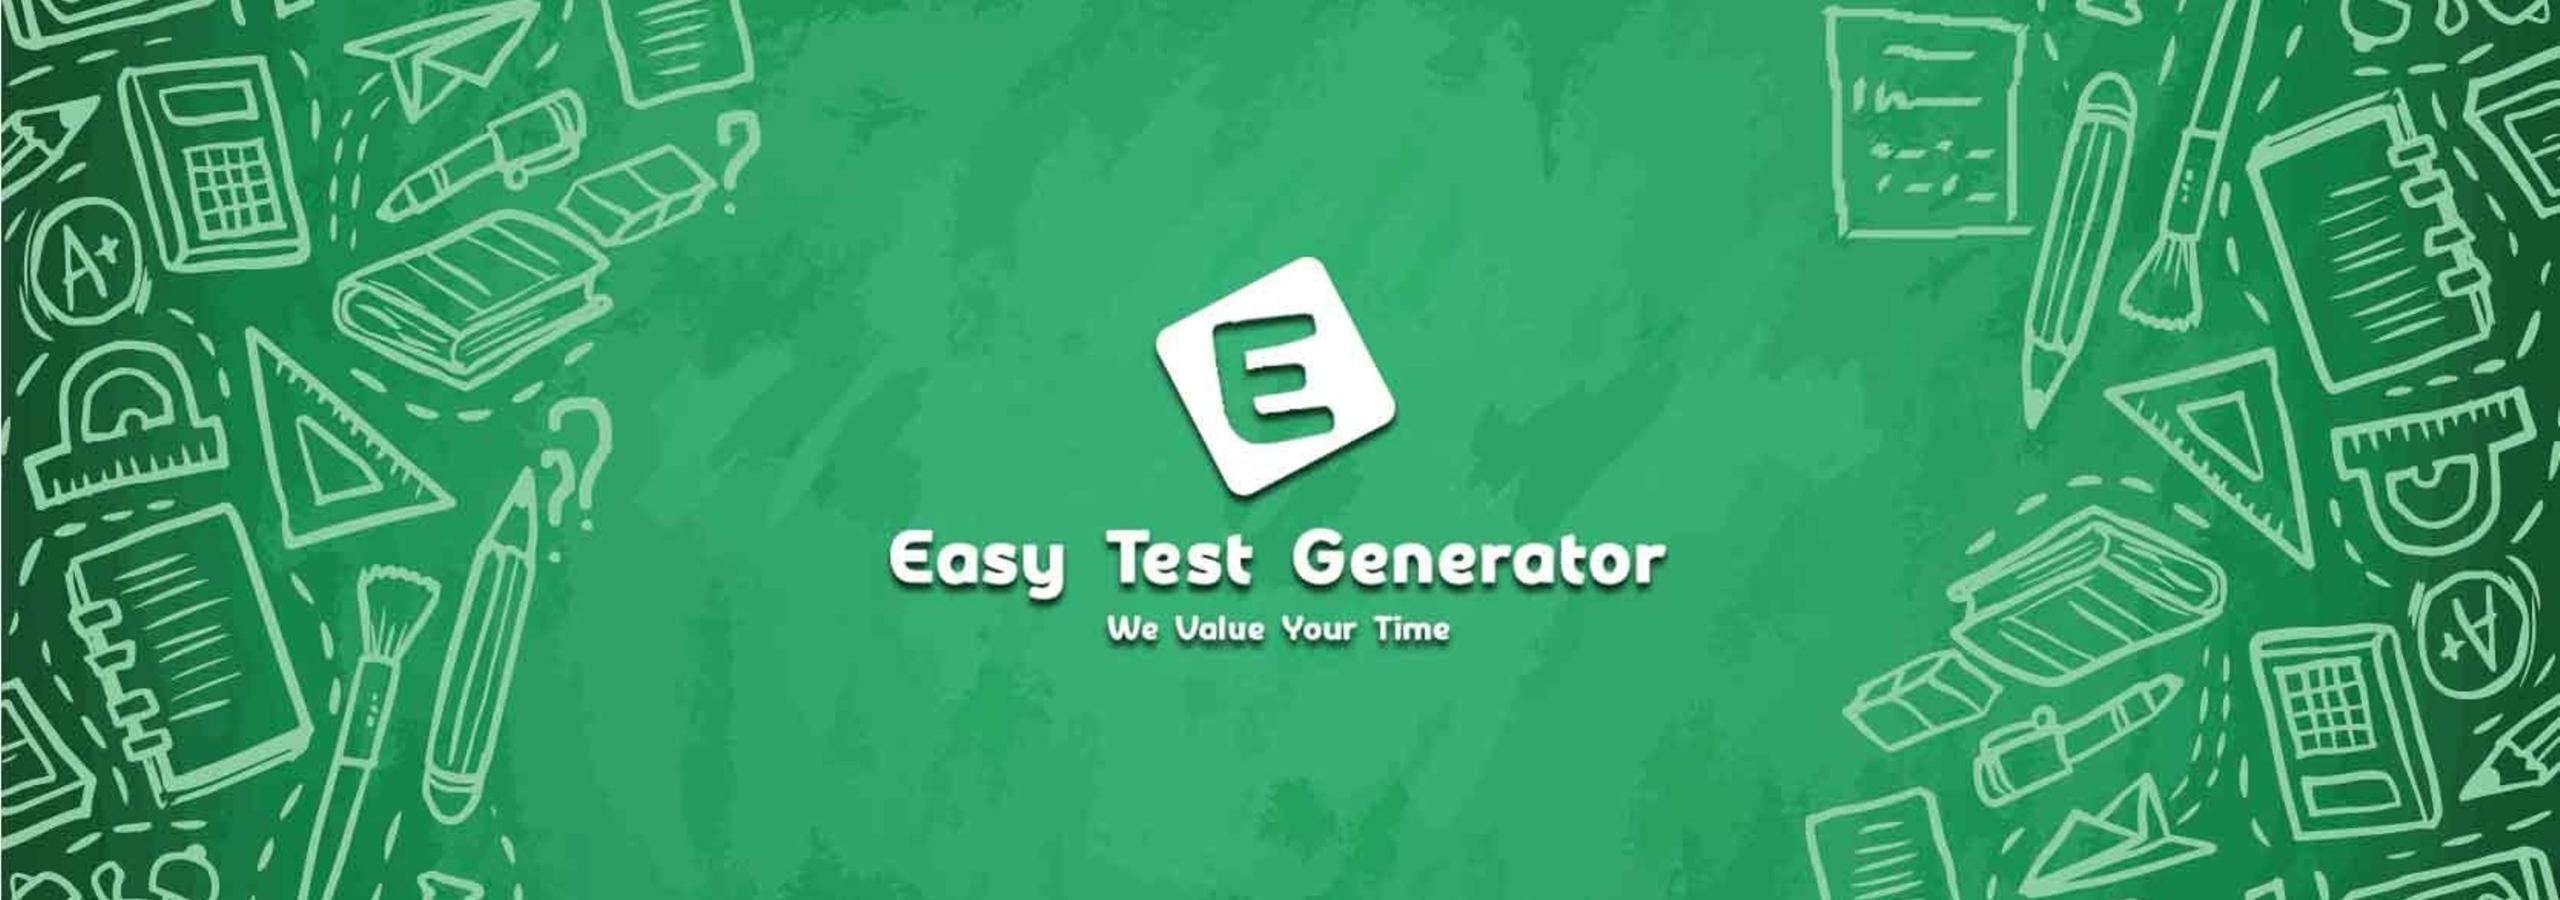 Easy Test Generator - Online Question Paper Maker (@easytestgenerator) Cover Image